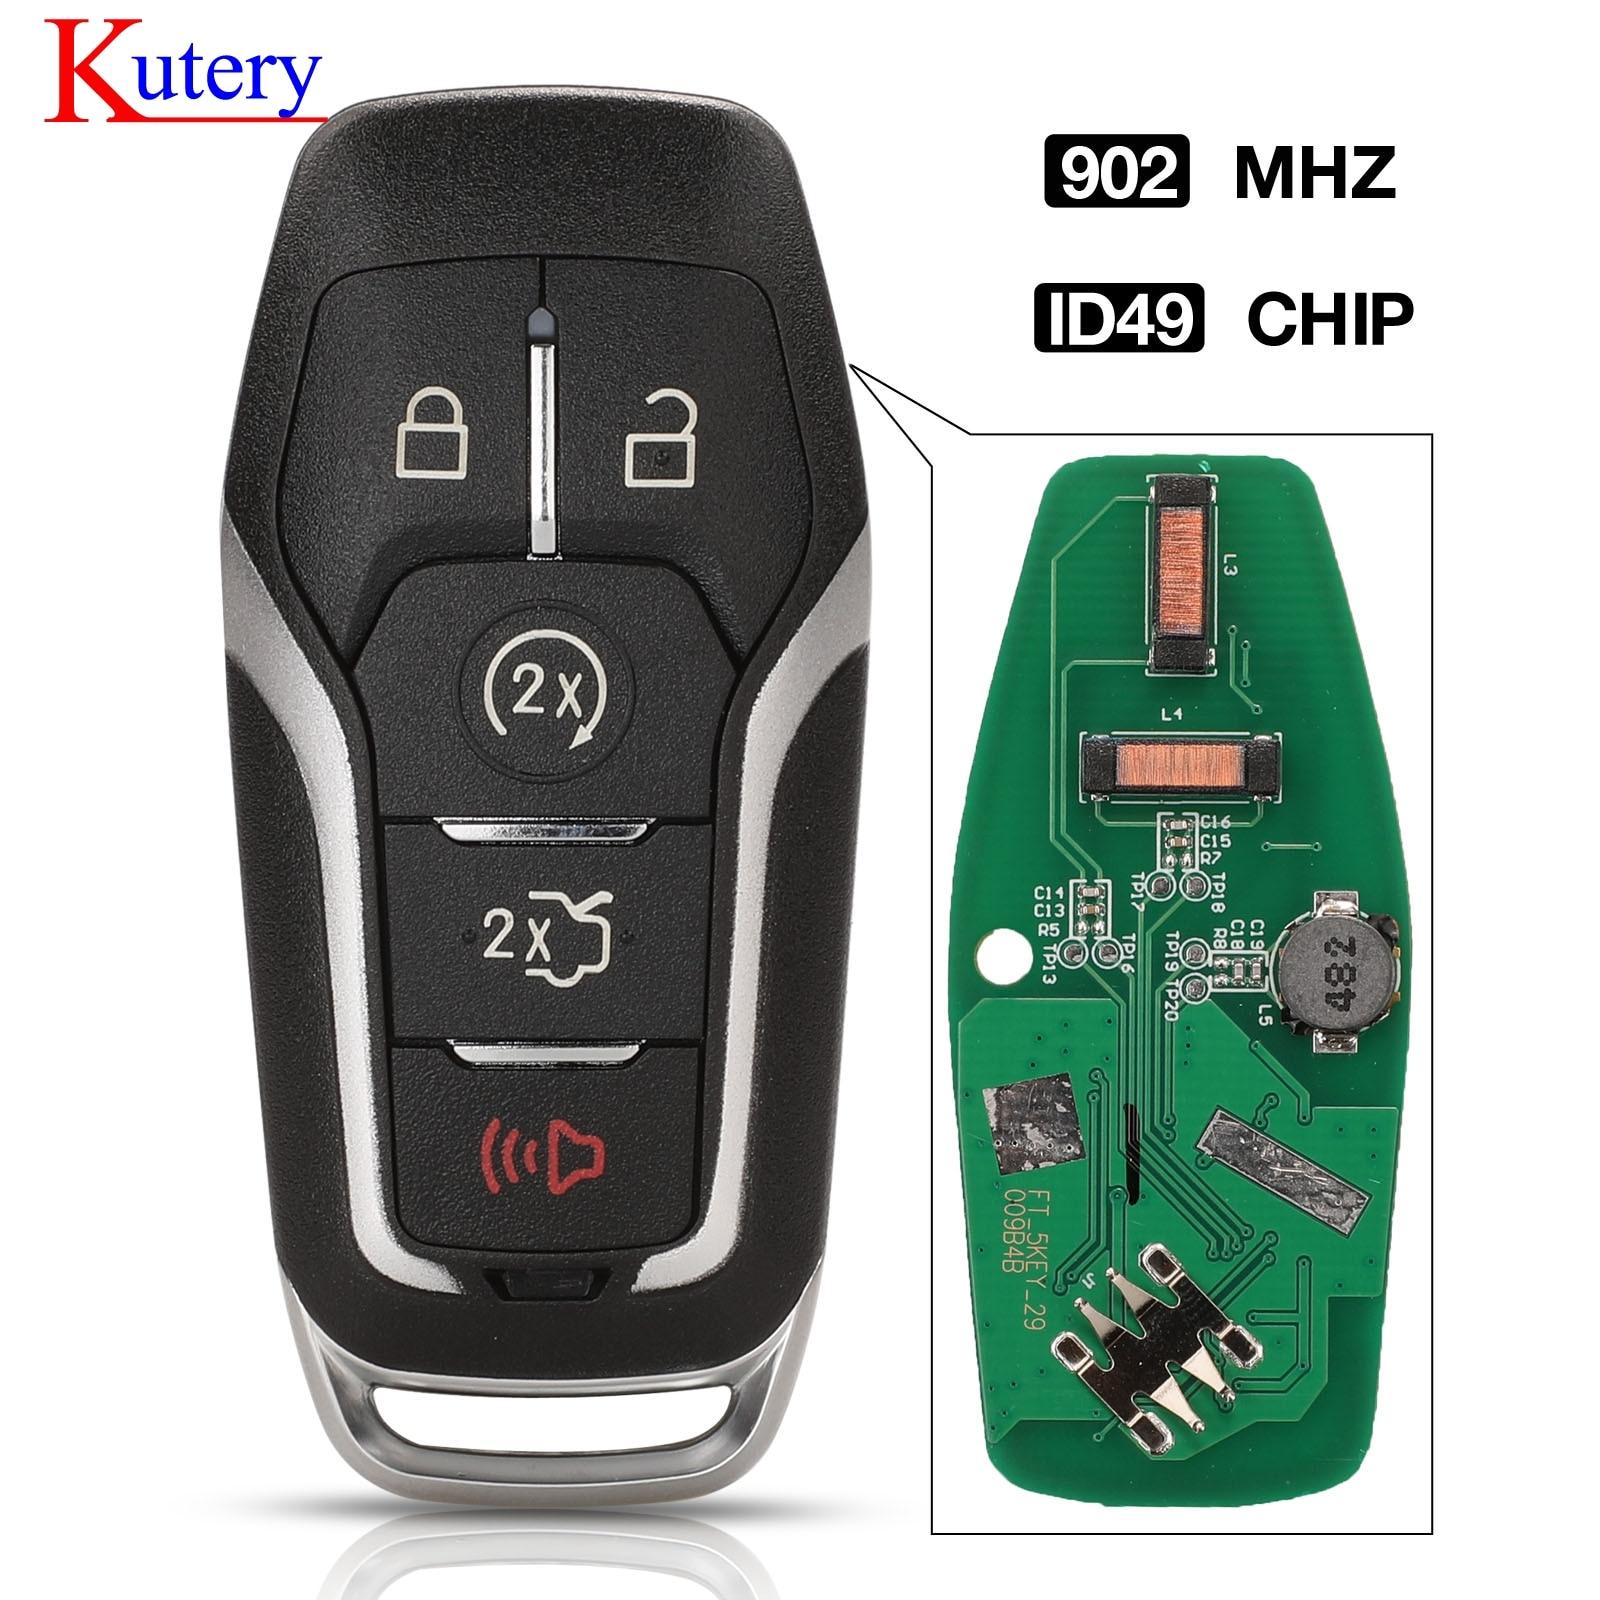 Kutery 4 + 1 botón remoto Inteligente 902 MHz HITAG PRO FCCID m3N-A2C31243300 para Ford Fusion Explorer borde Mustang 2013-2017